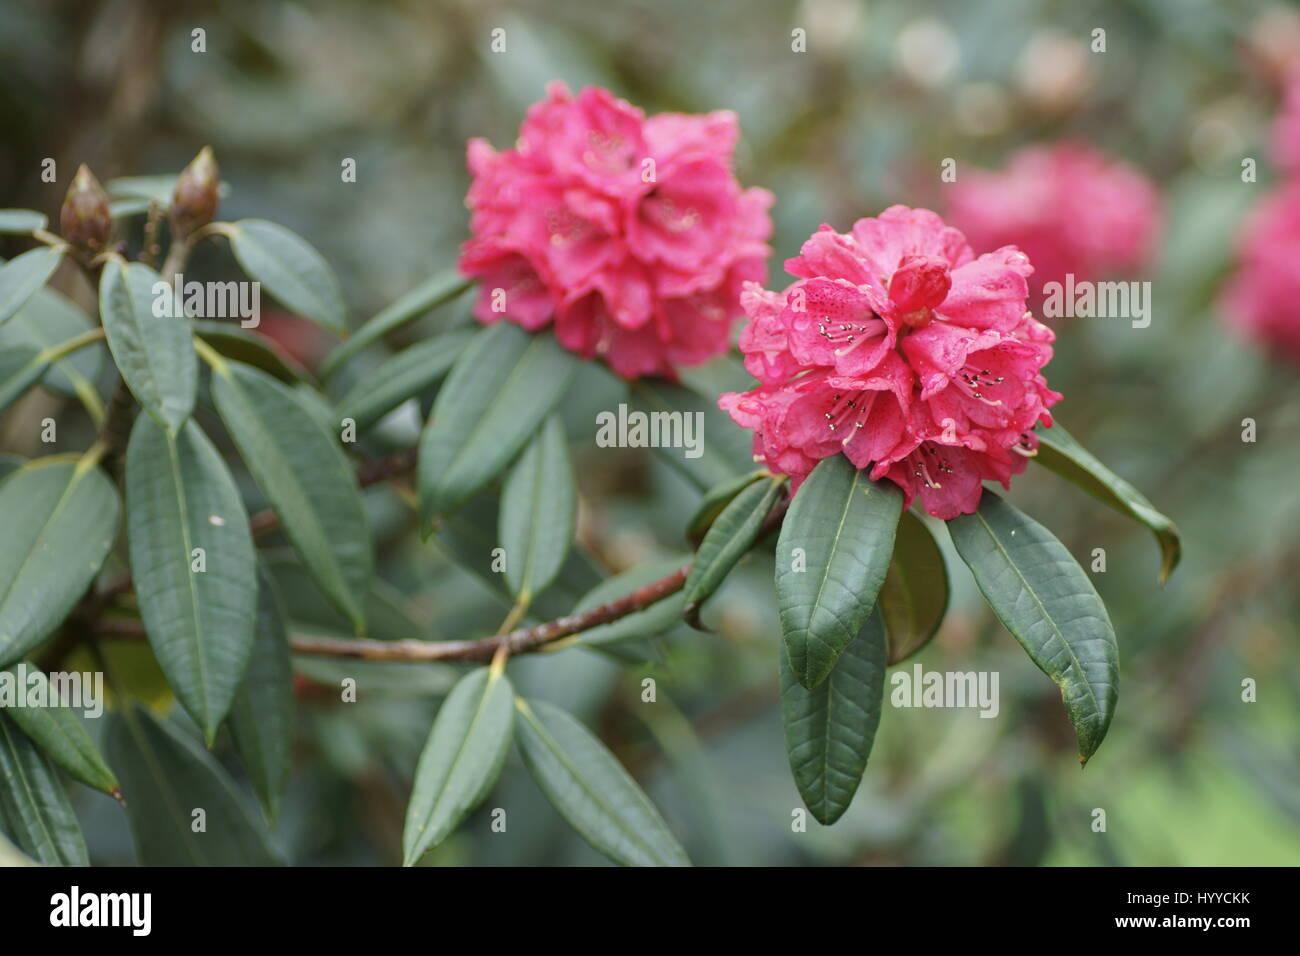 Rhododendron arboreum - Stock Image